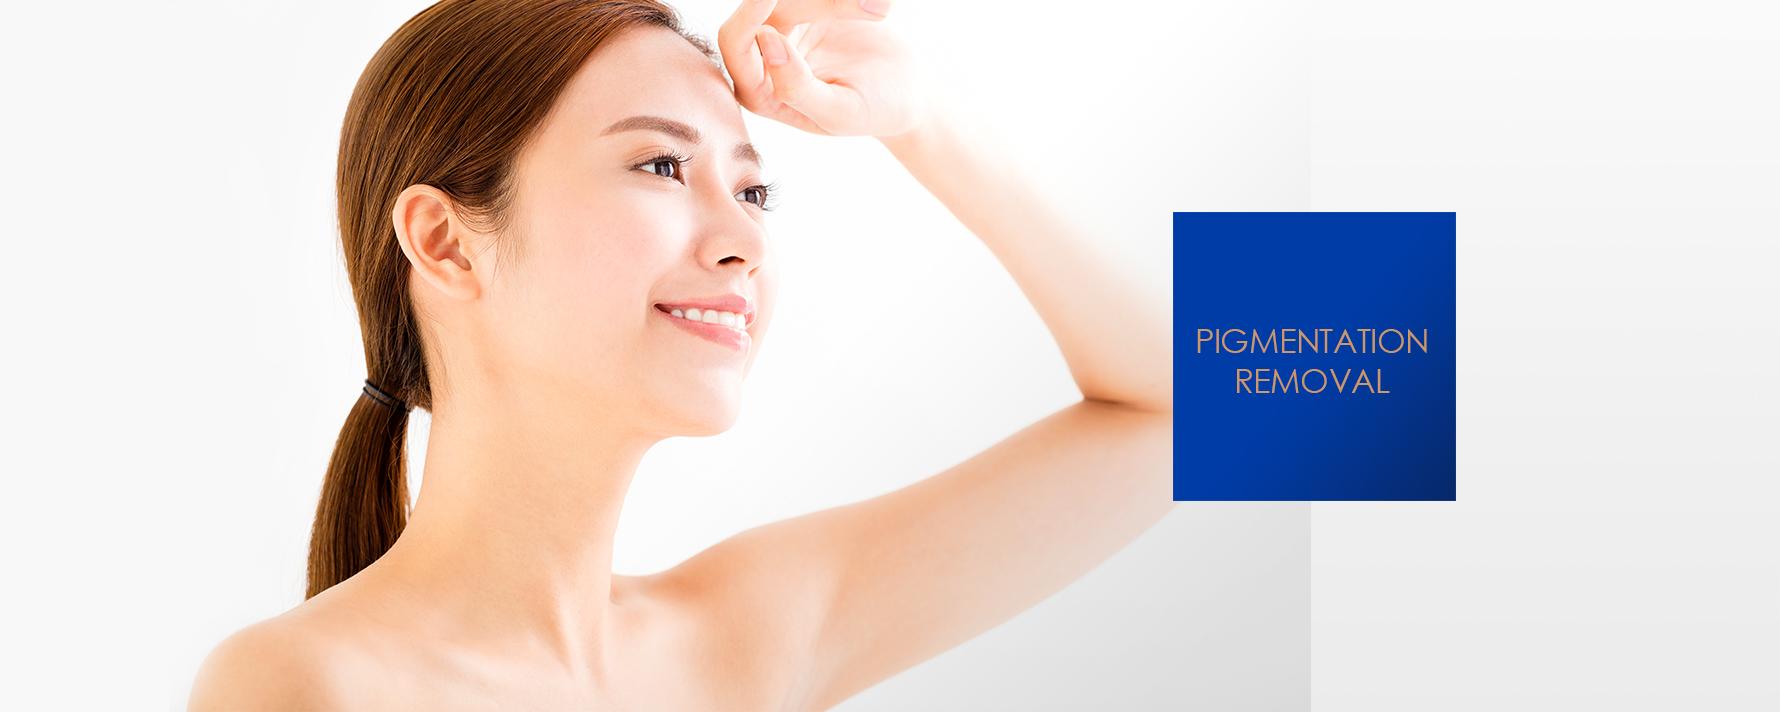 Dr Scinn Aesthetics Pigmentation Removal